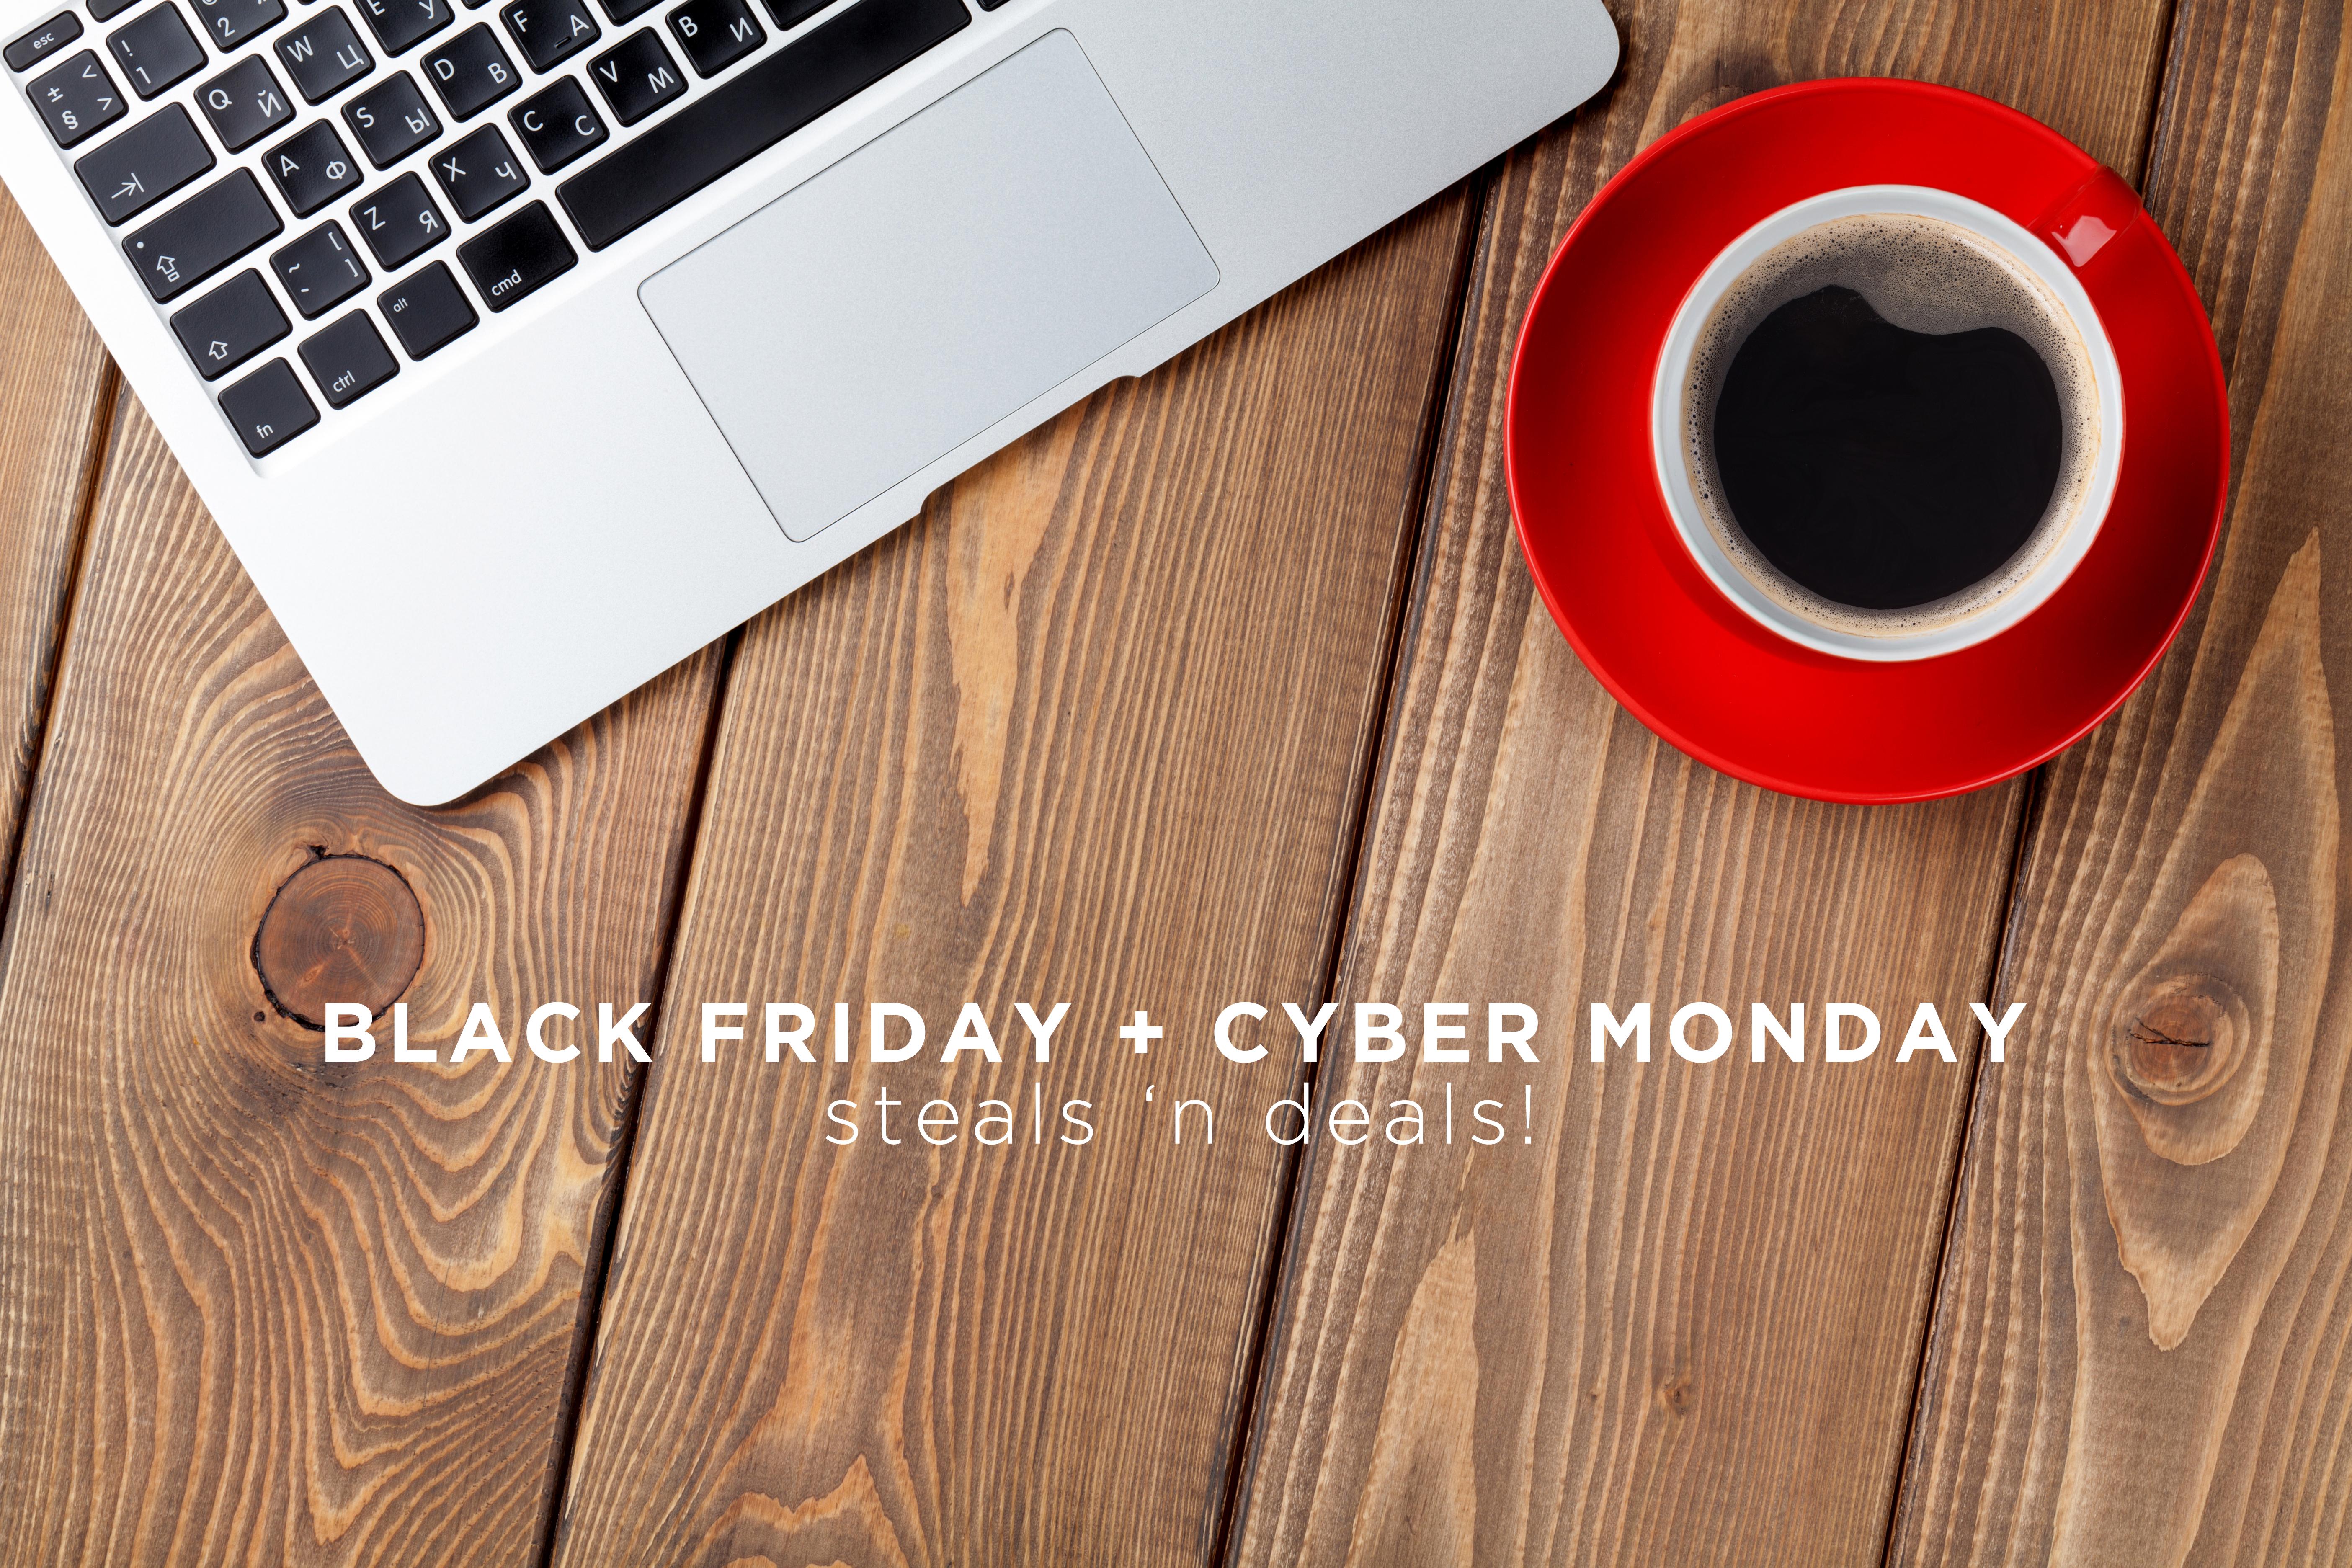 BLACK FRIDAY + CYBER MONDAY STEALS 'N DEALS!